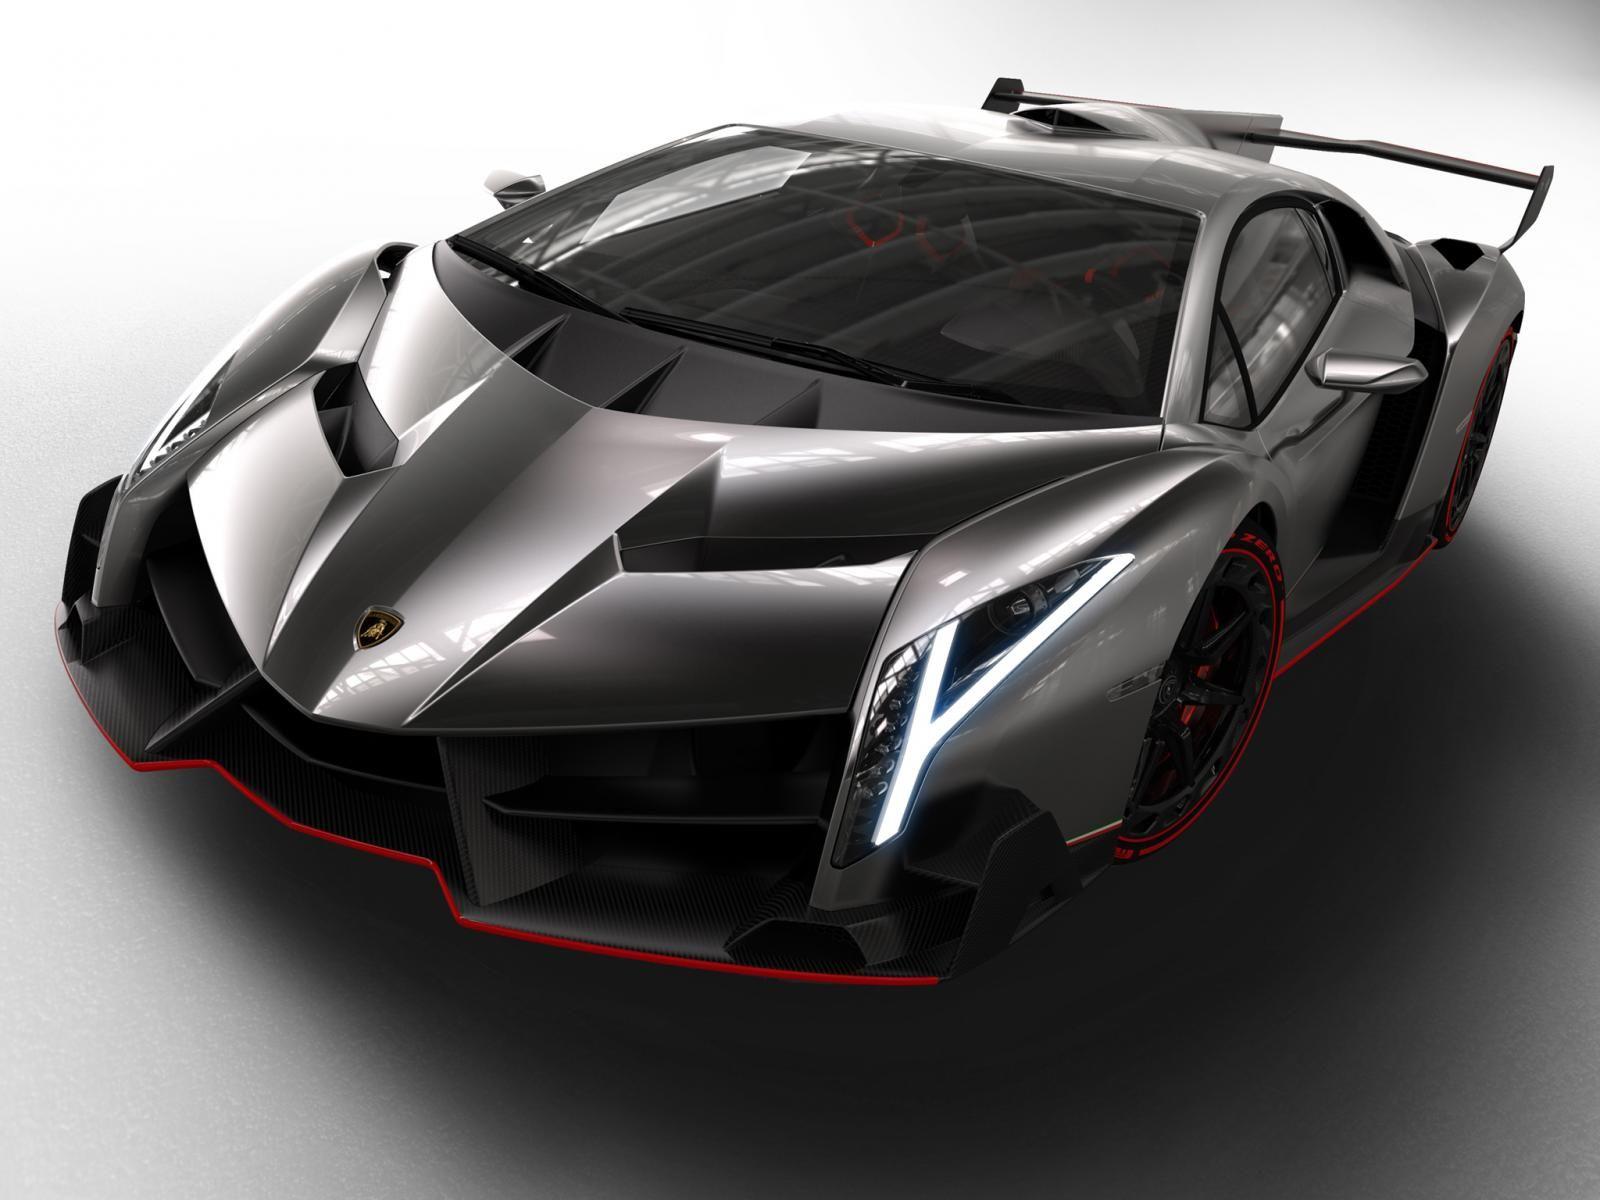 Lamborghini Veneno Roadster $4,400,000